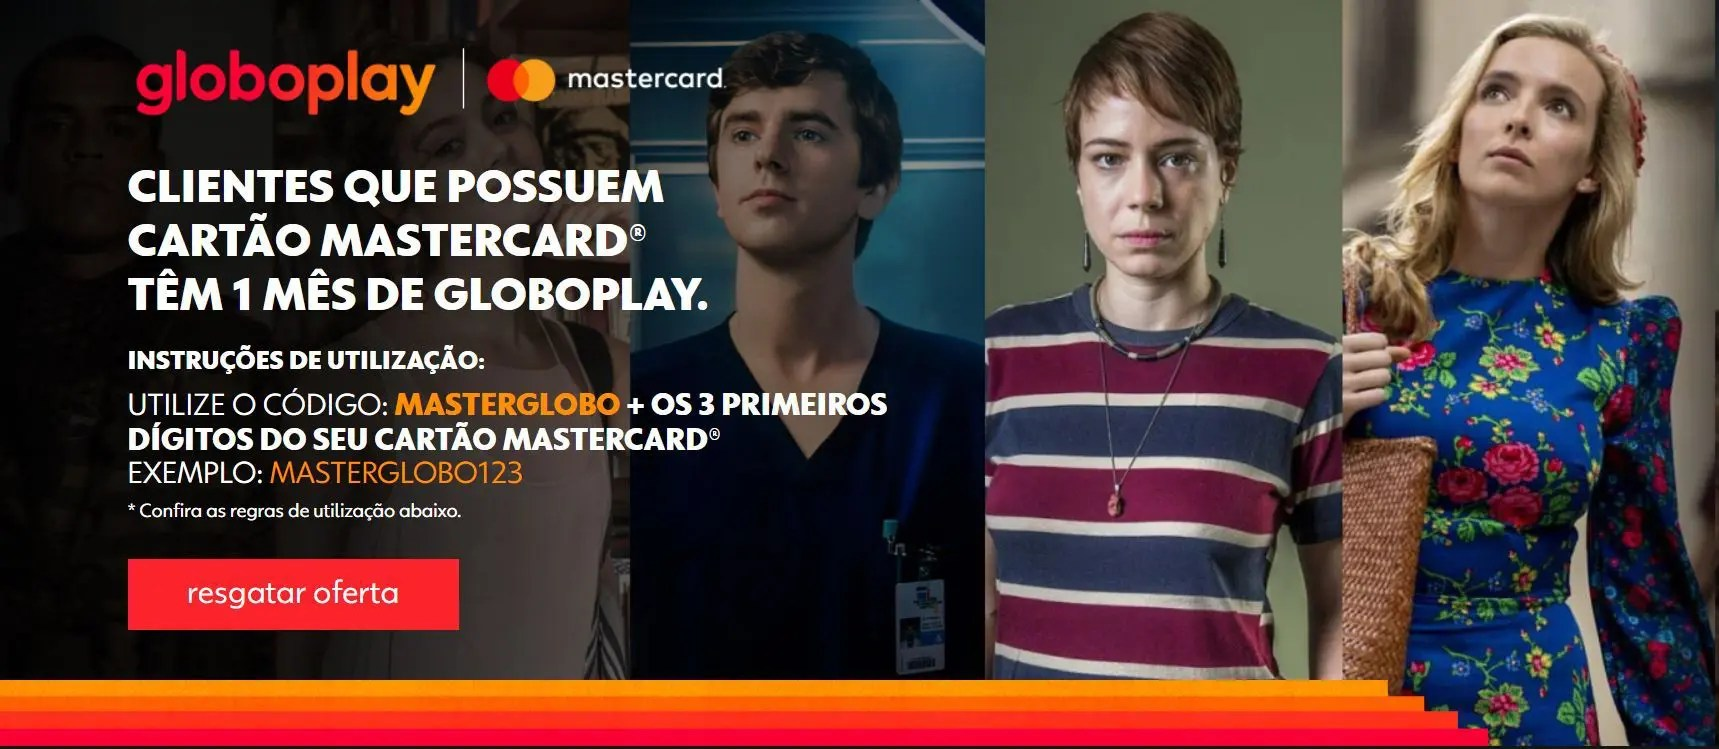 Mastercard Globoplay